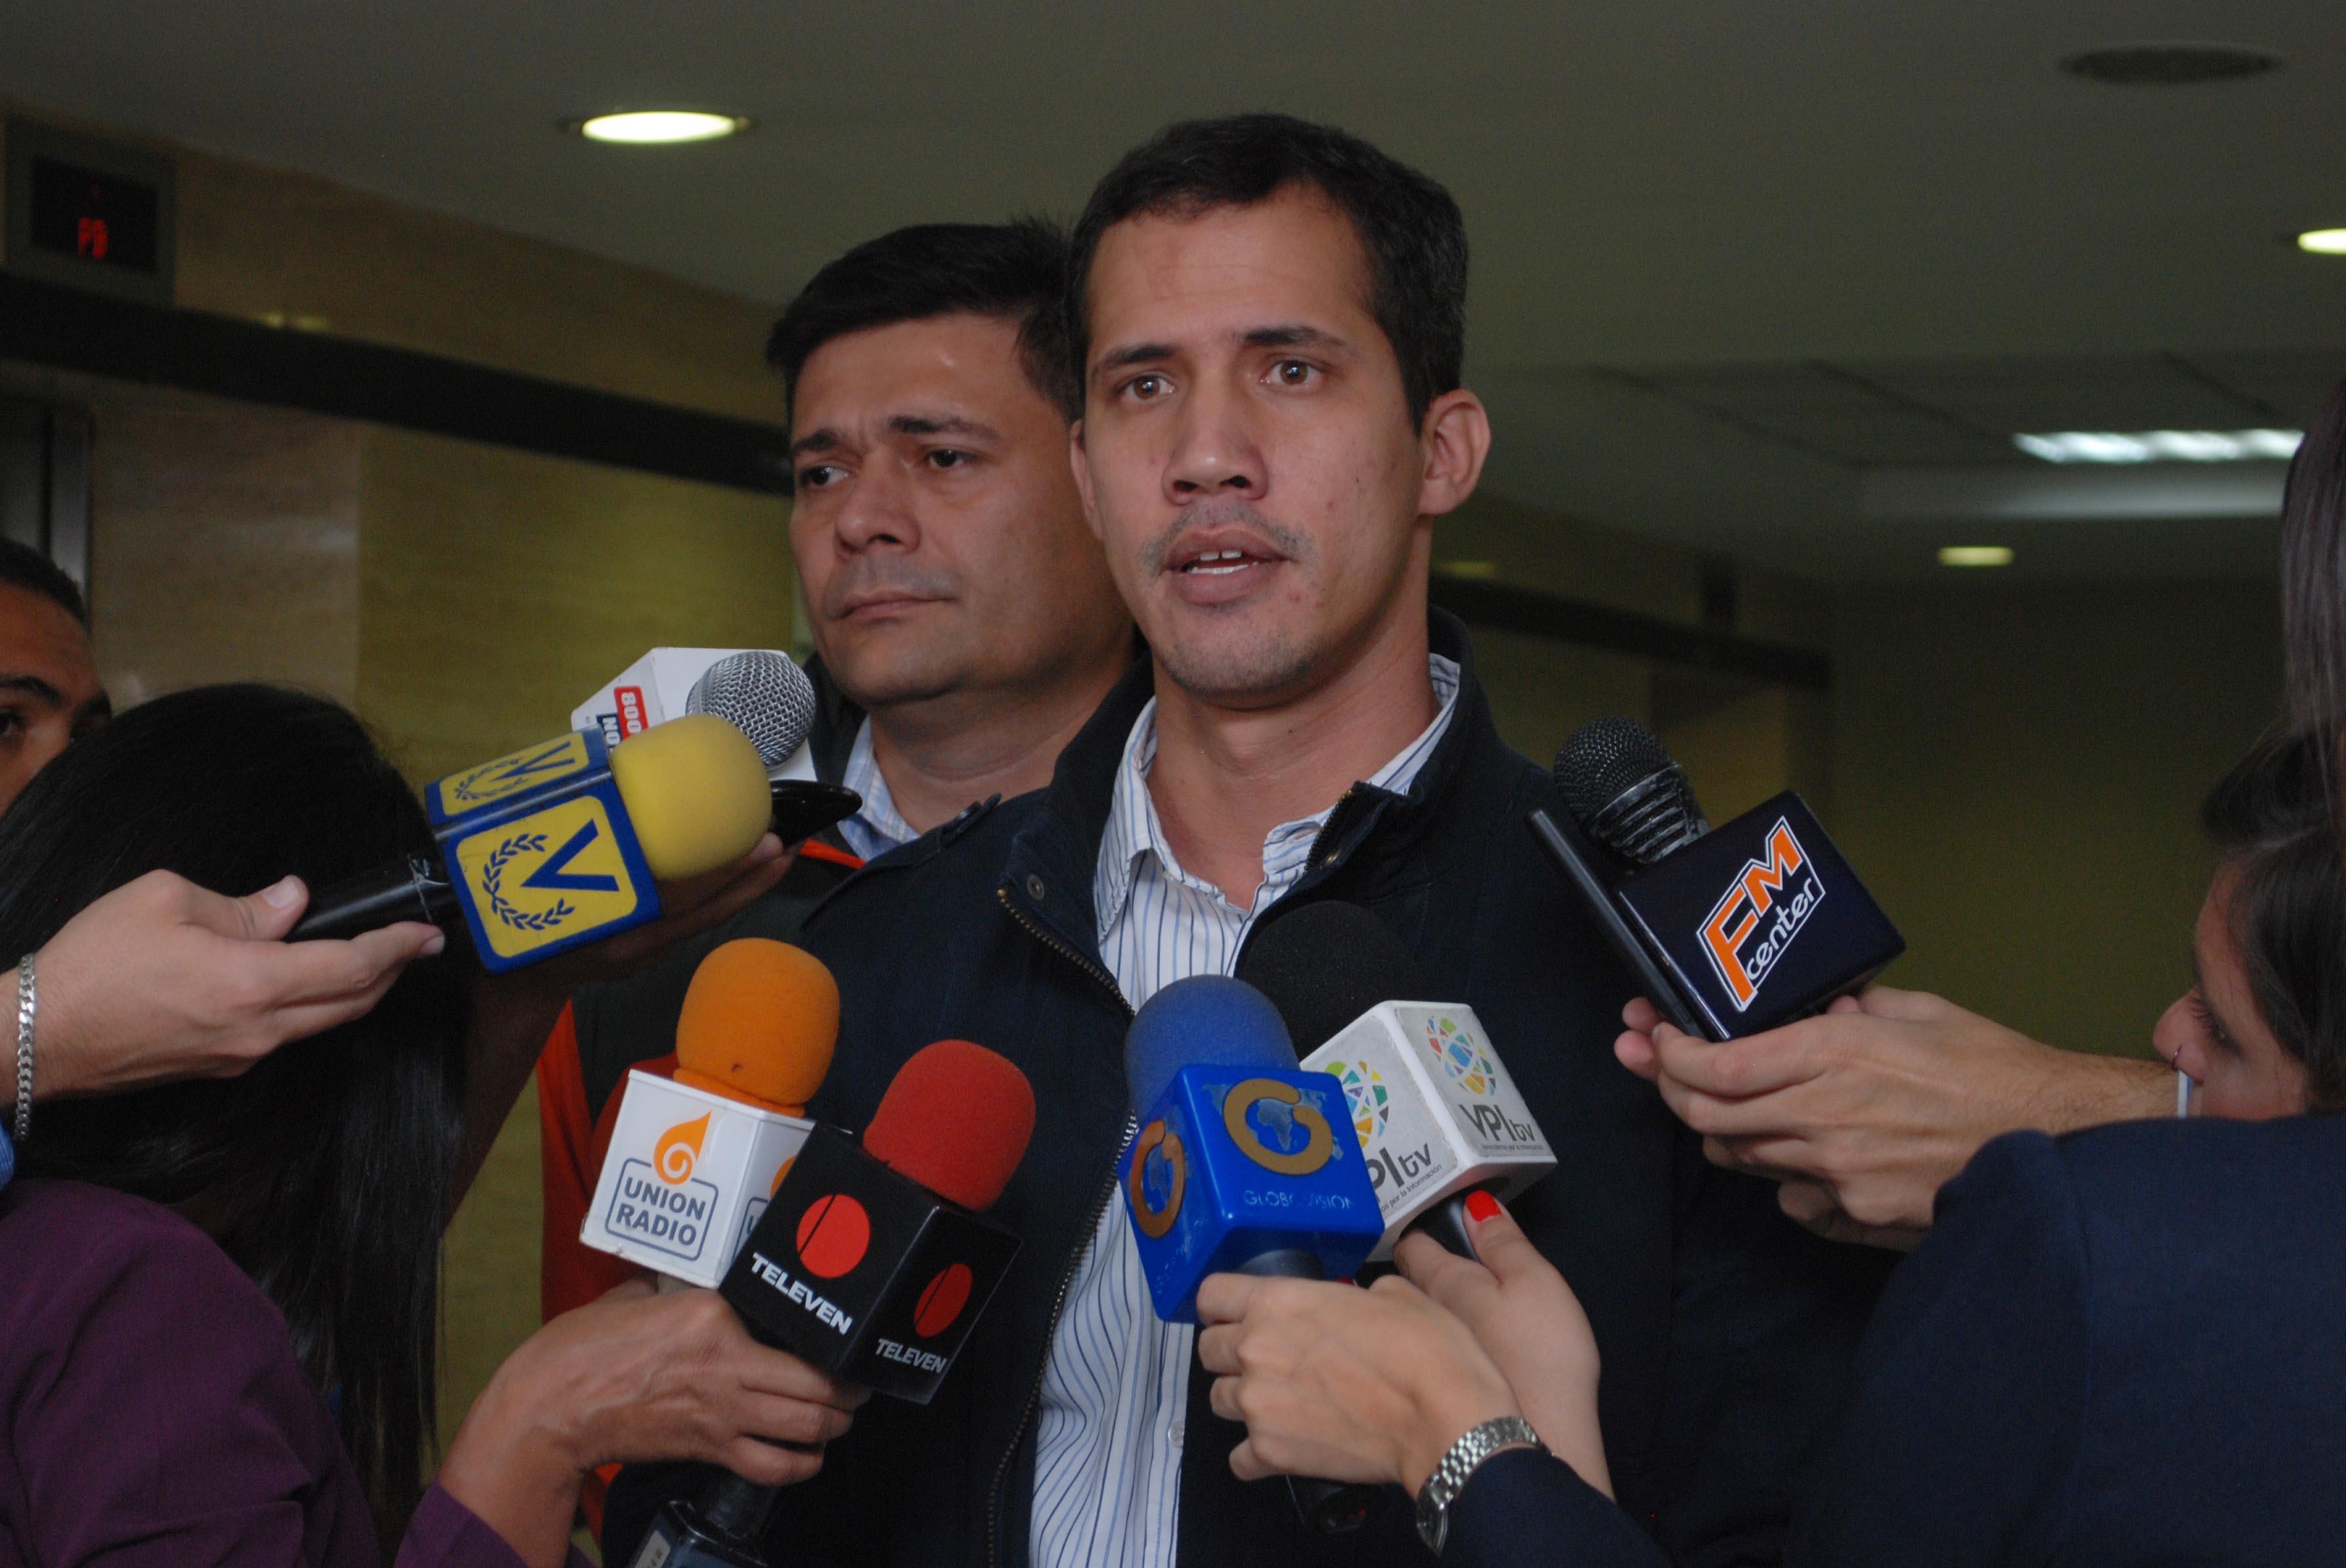 No habrá referéndum porque la MUD perpetró un gigantesco fraude — Jorge Rodríguez